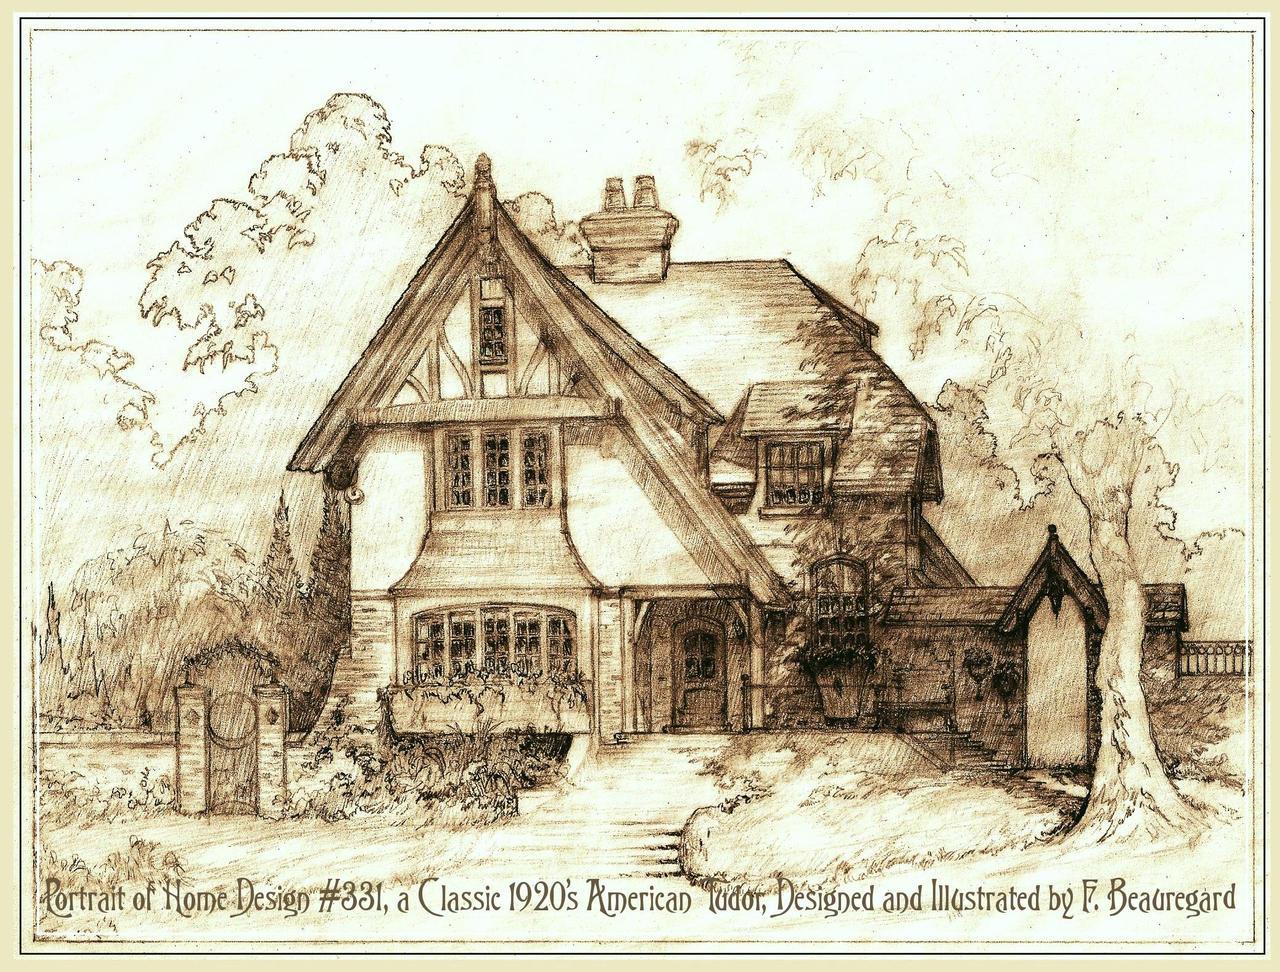 Jonbenet Ramsey House Floor Plan Portrait Of House 331 A Classic Tudor By Built4ever On